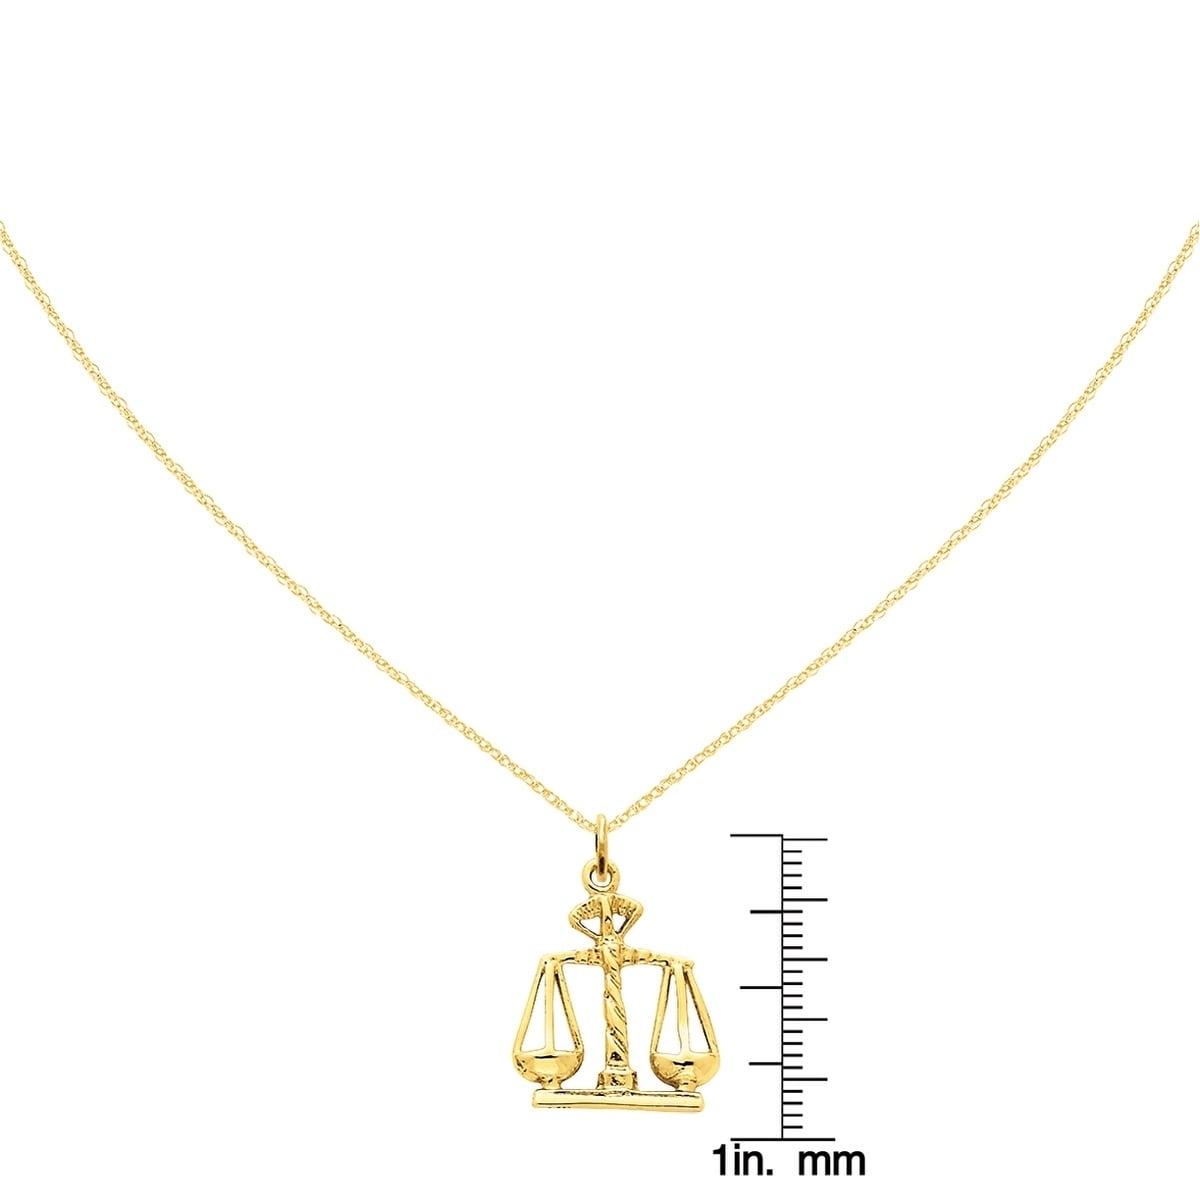 Bijoux, montres 14K Yellow Gold Scales Of Justice Charm A1493 Breloques, bracelets breloques